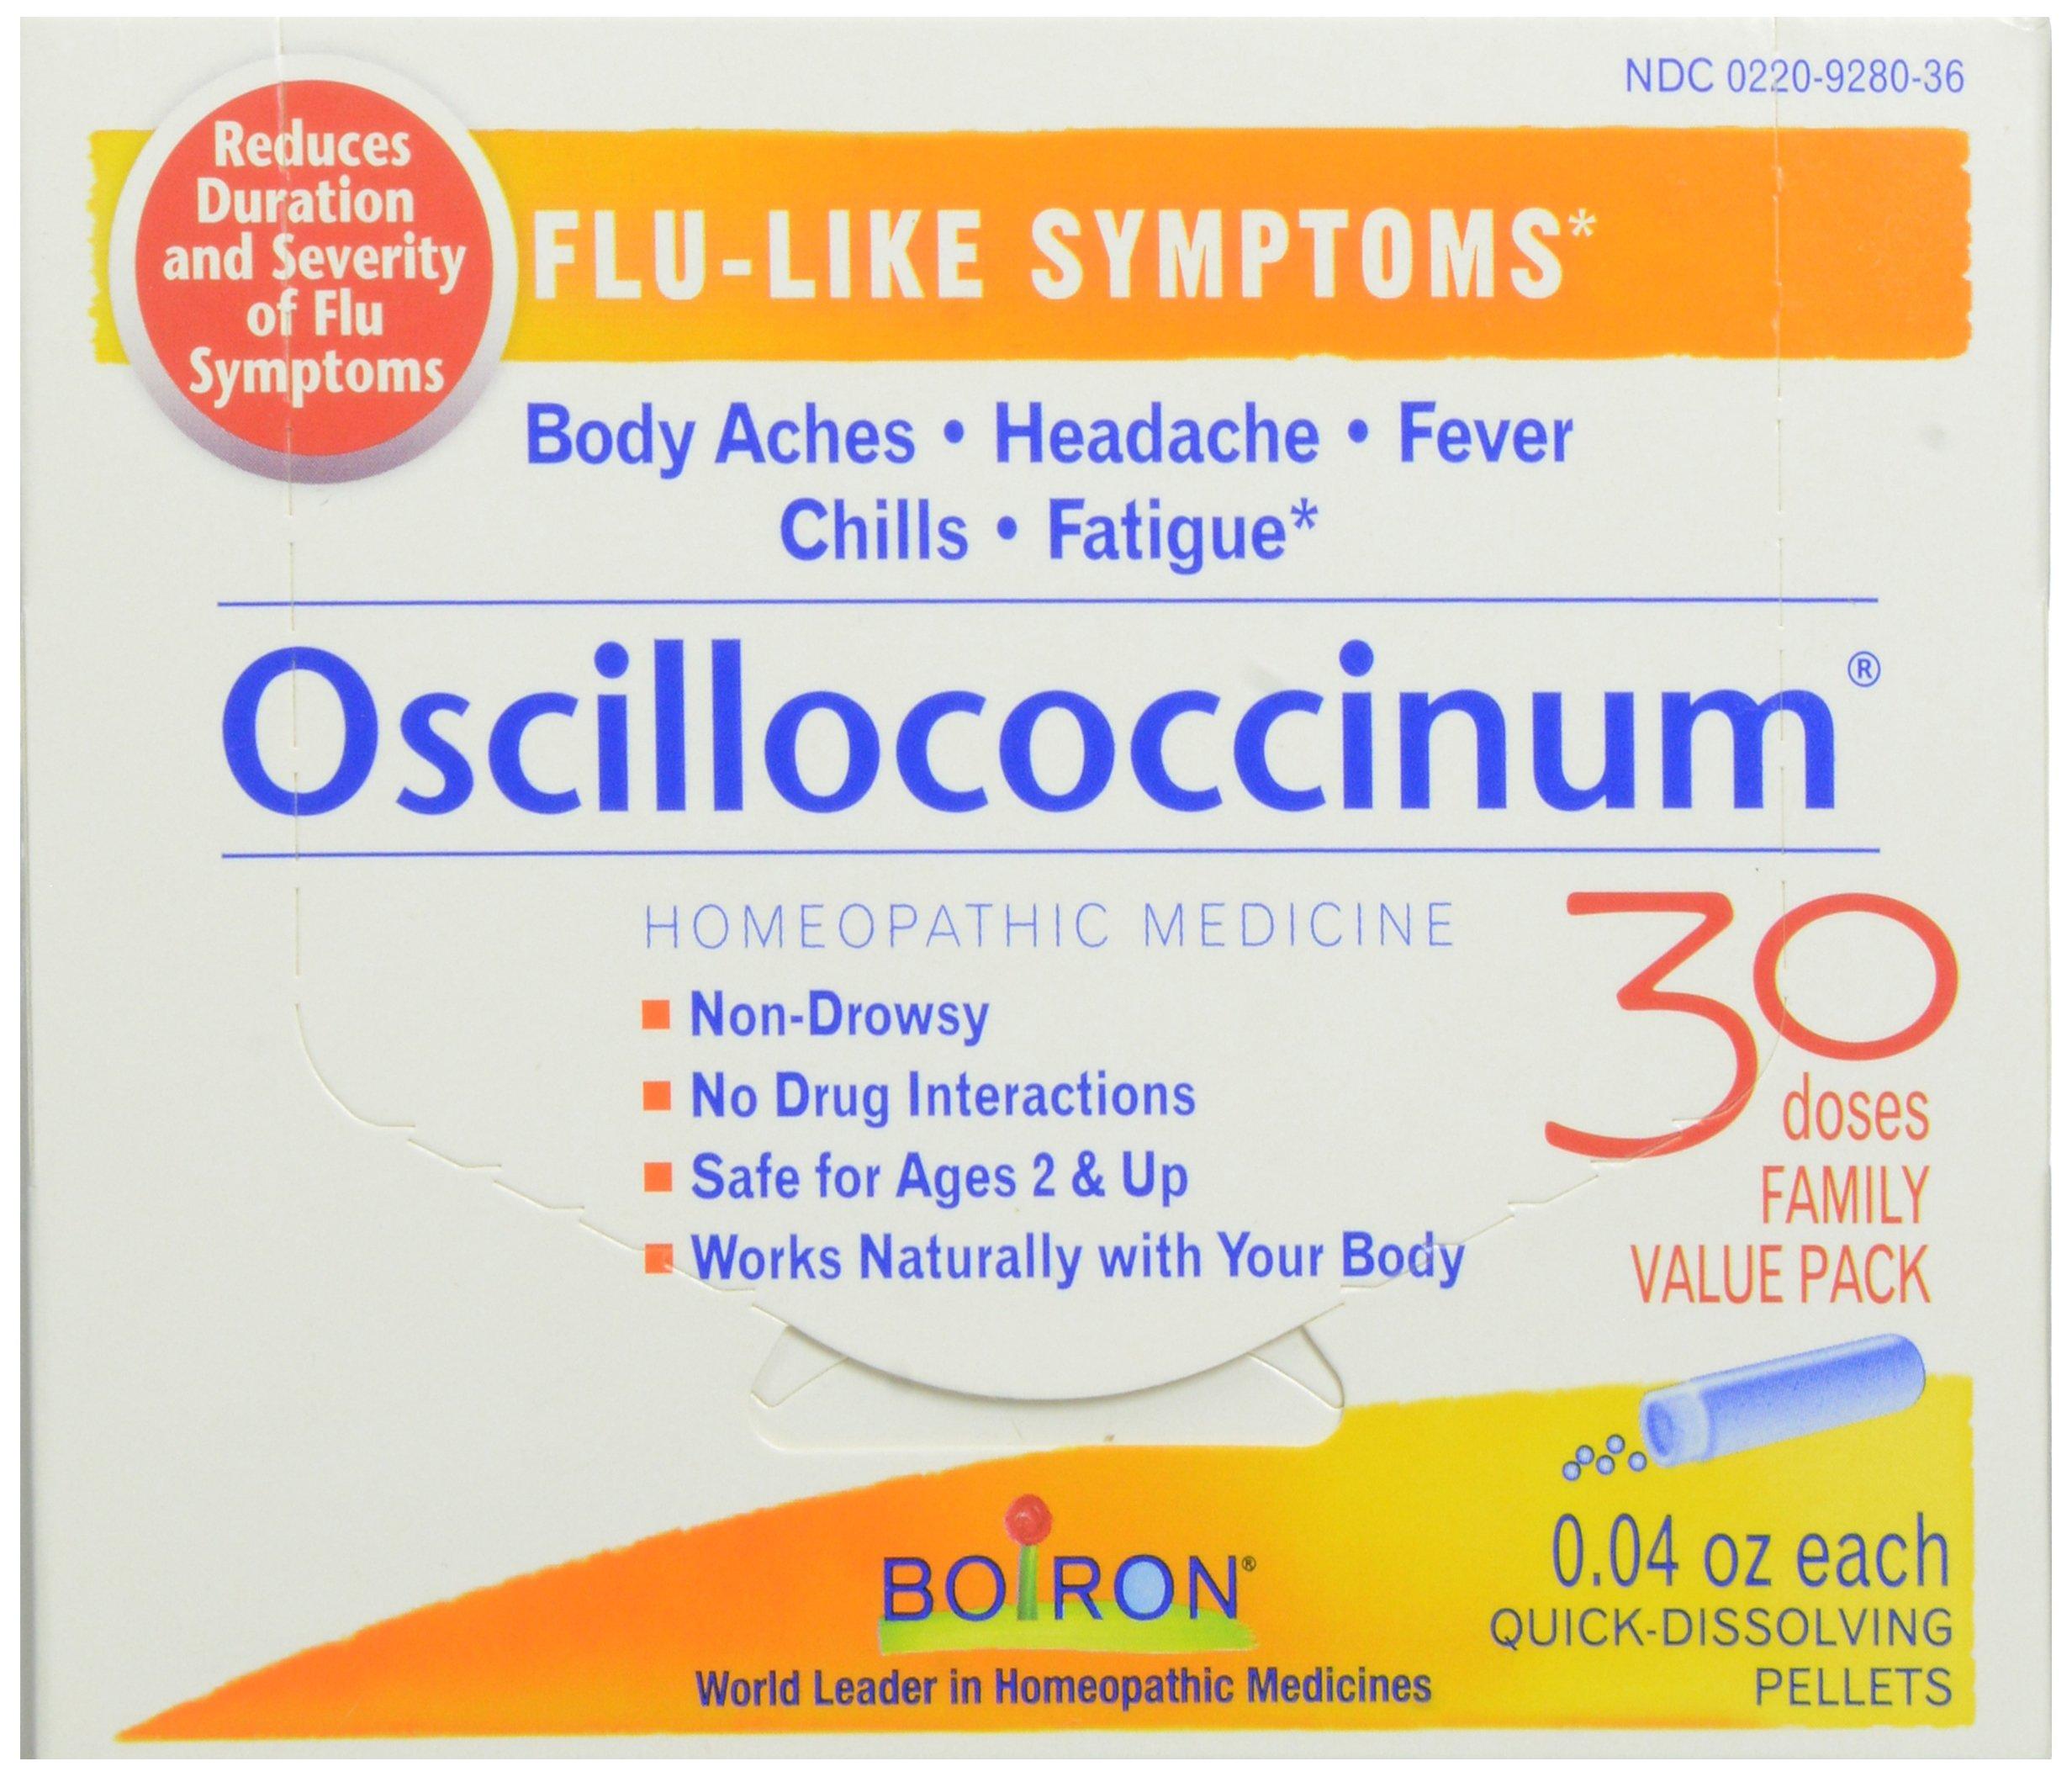 Boiron Oscillococcinum, 0.04 Ounce (30 Count), Homeopathic Medicine for Flu-like Symptoms